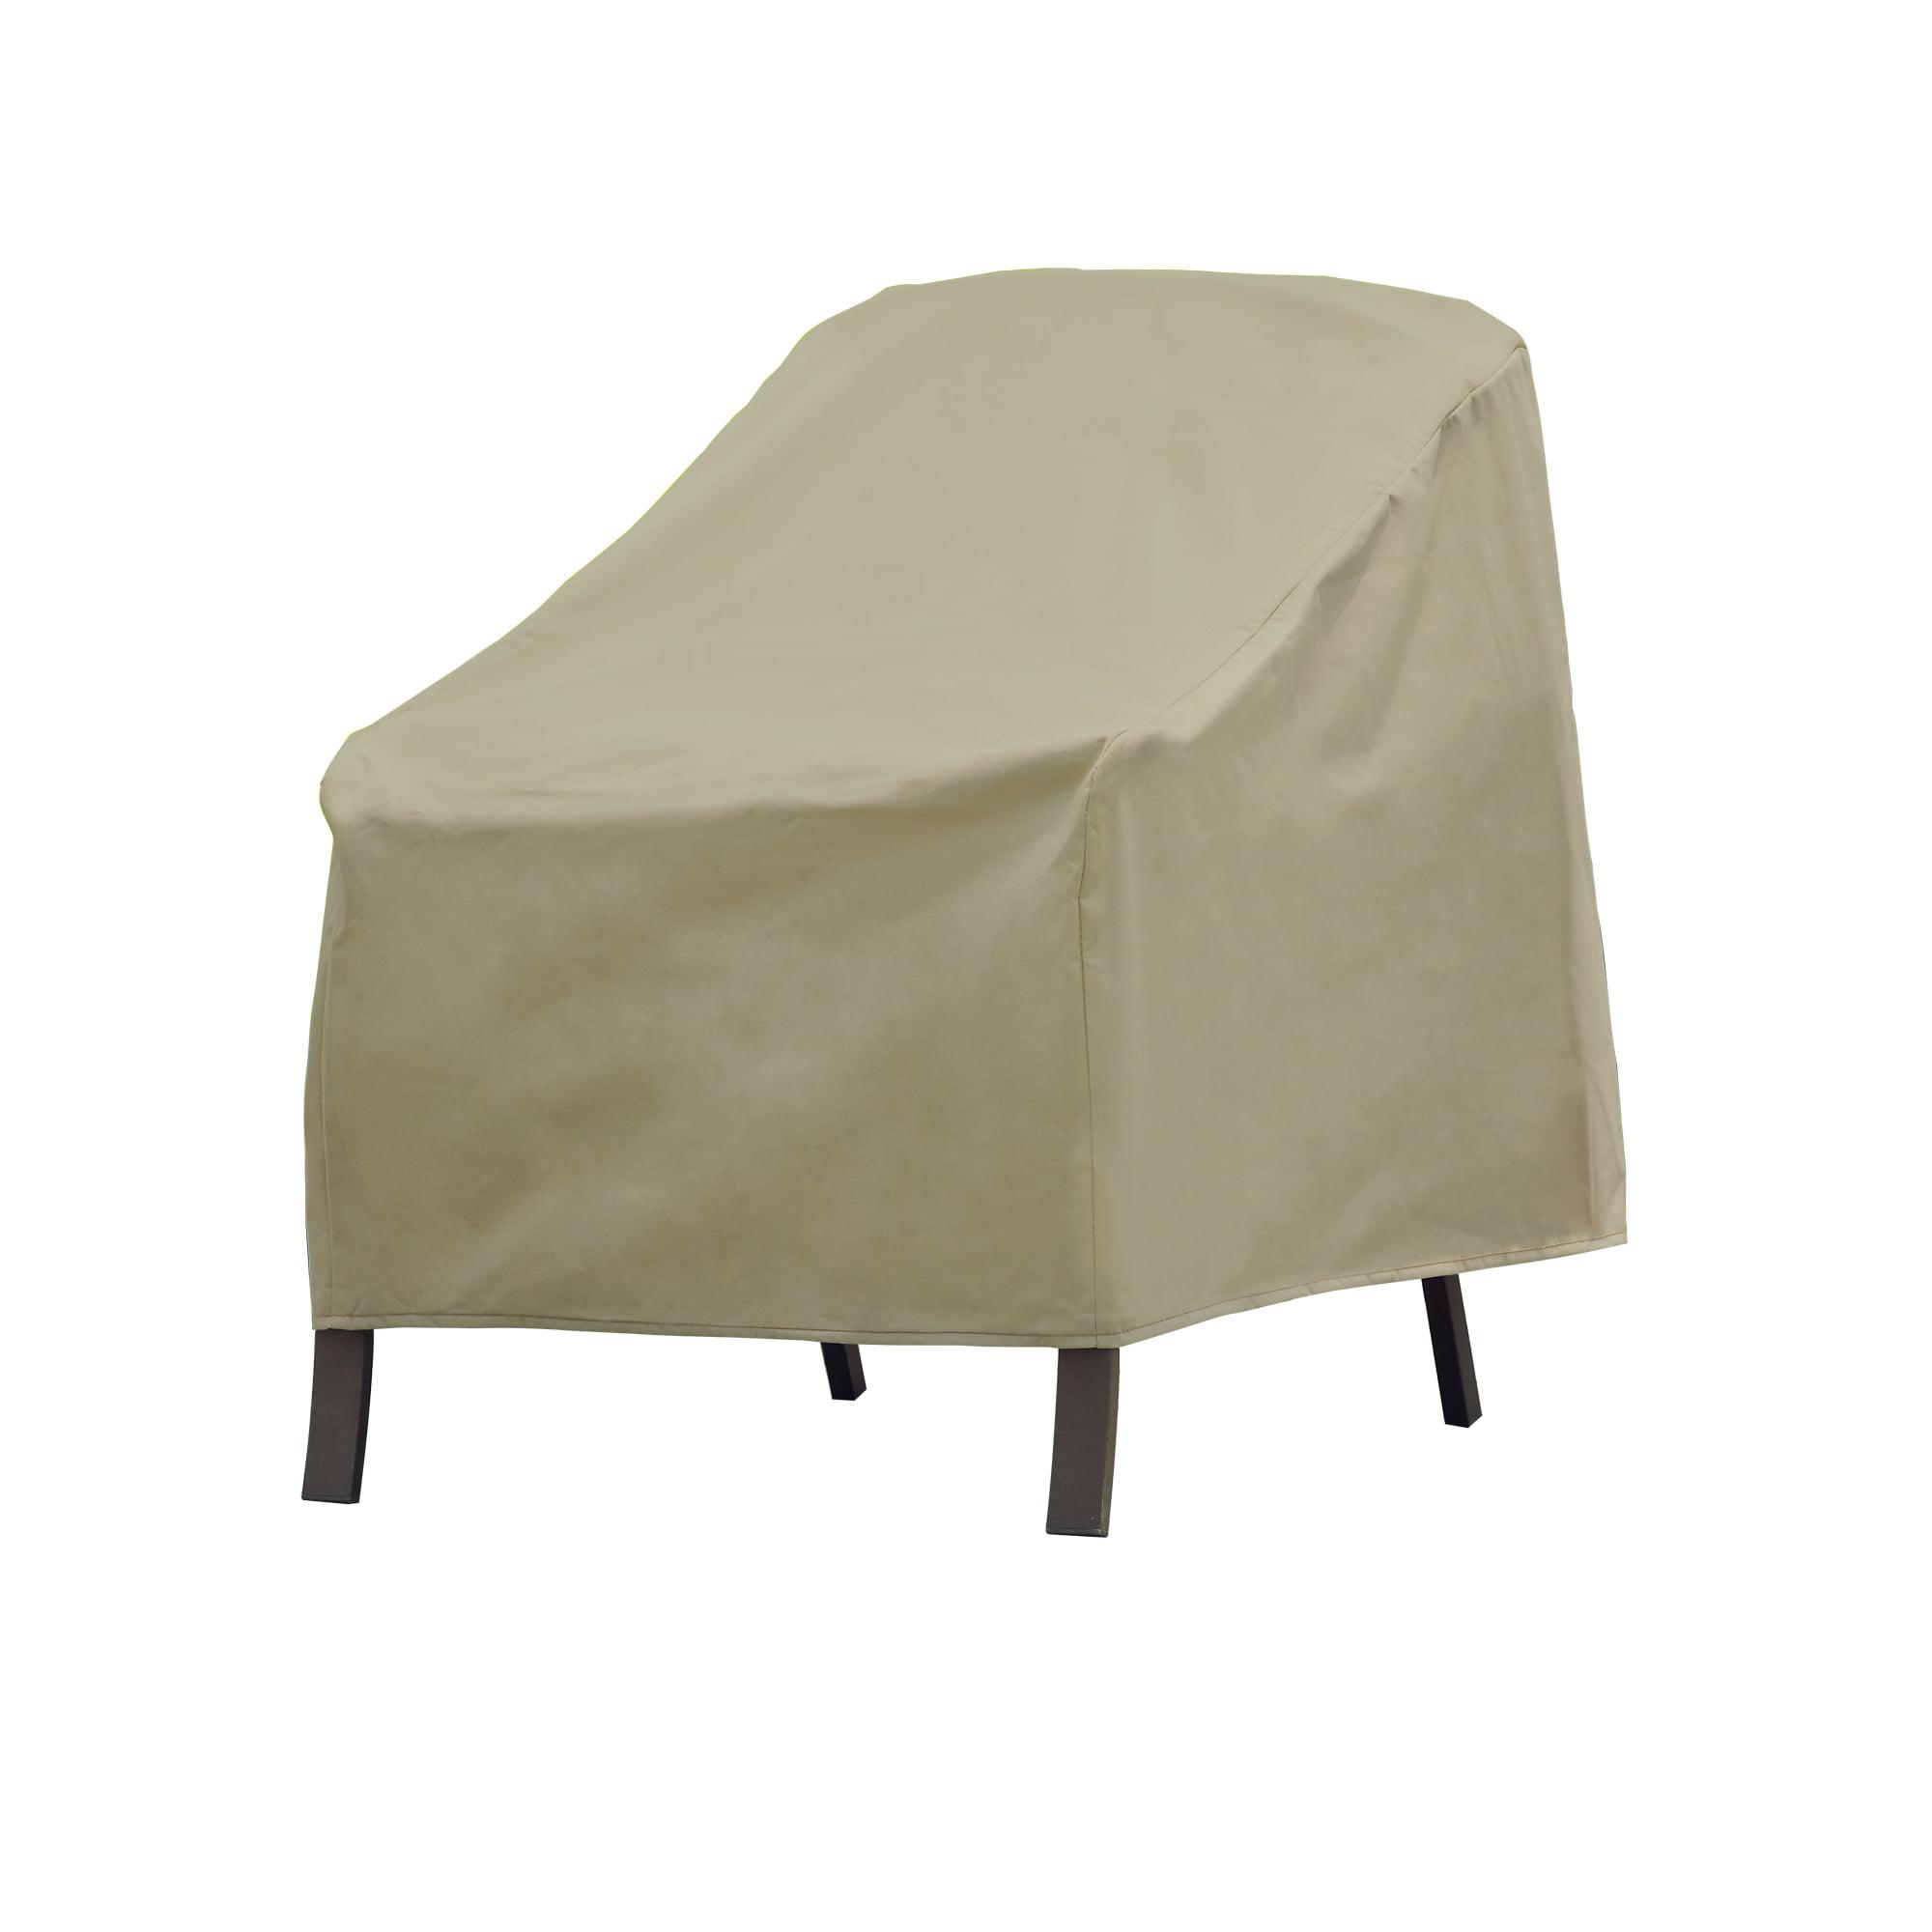 Modern Leisure Basics Outdoor Patio Chair Cover 33 W X 34 D X 31 H Khaki Walmart Com Walmart Com